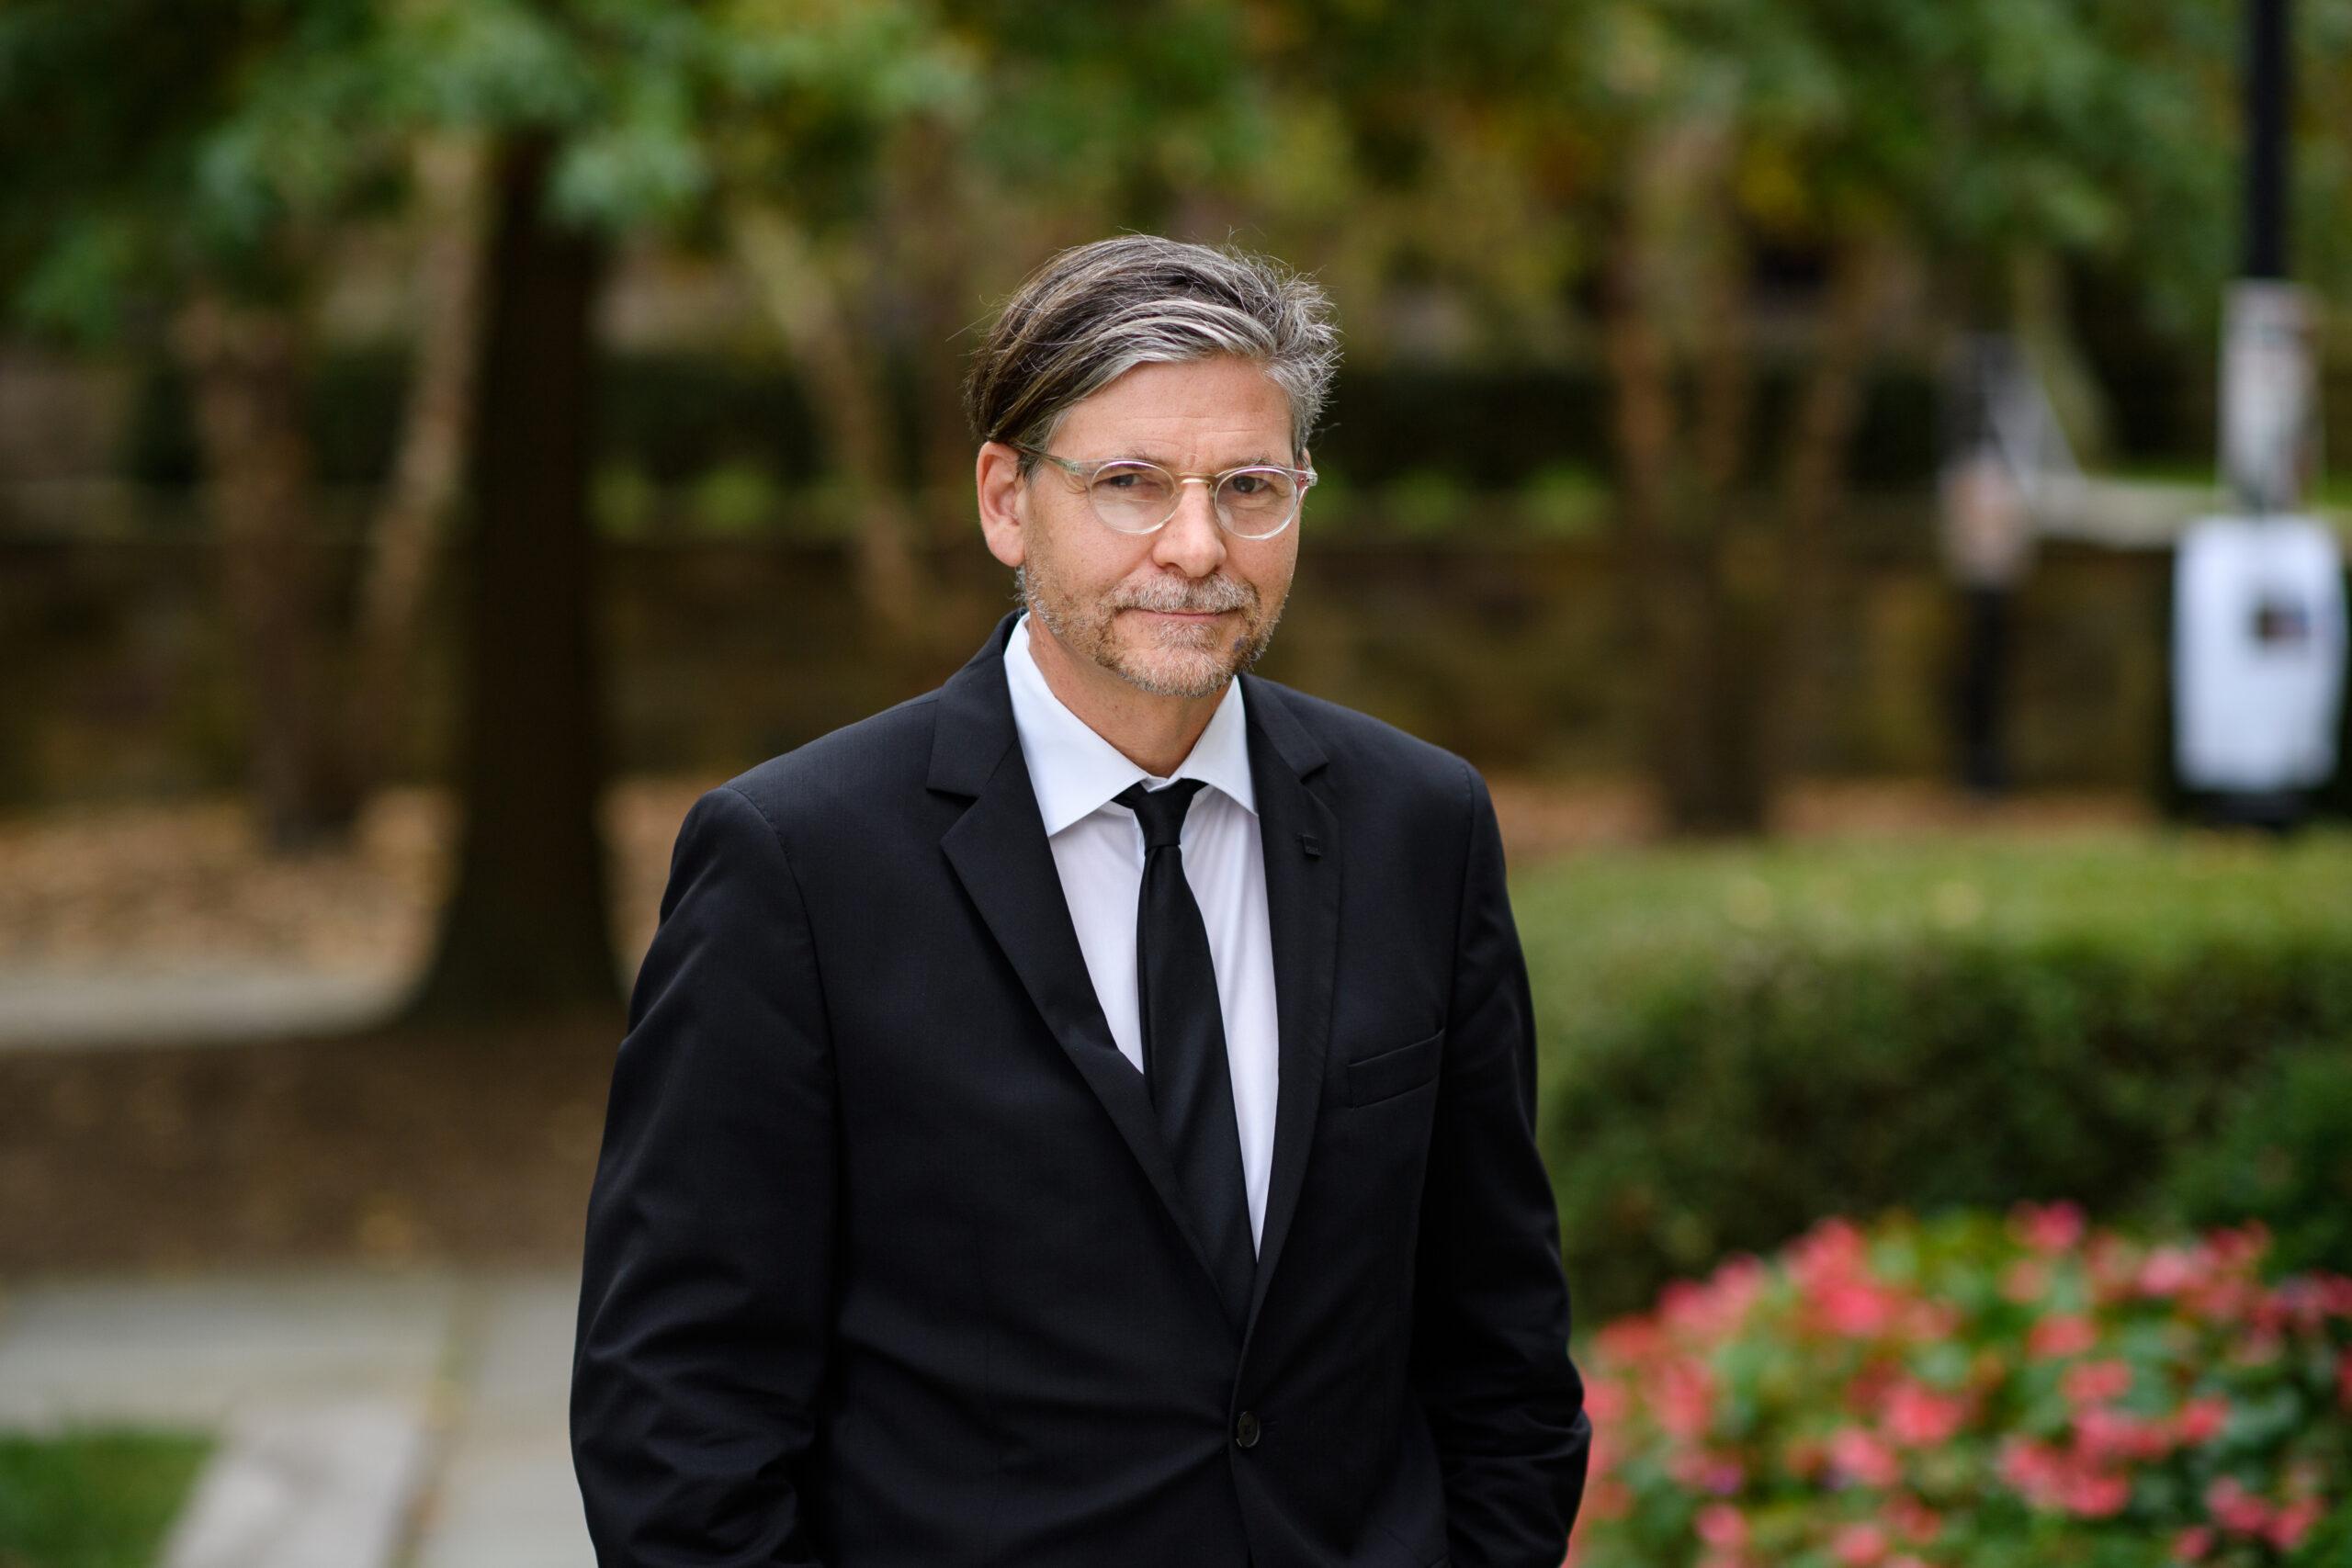 Munich Dialogues on Democracy welcomes back Professor Jan-Werner Mueller